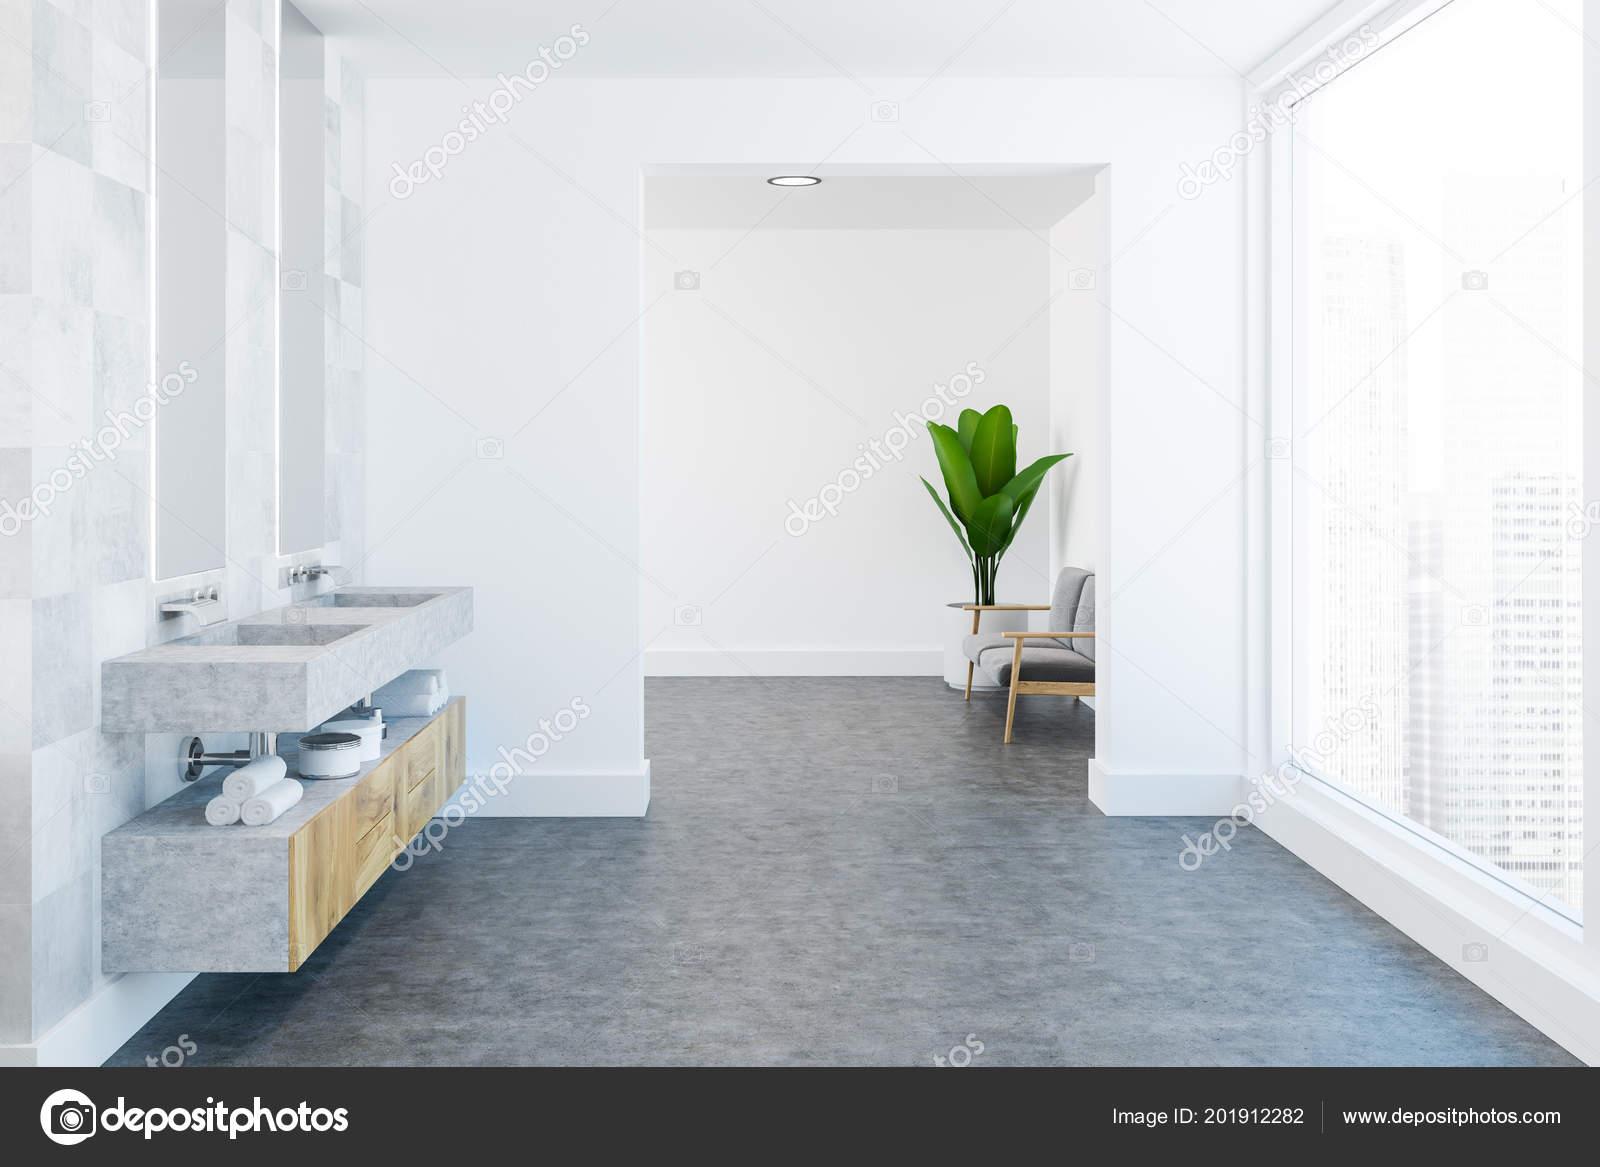 White Tile Spacious Luxury Bathroom Interior Concrete Floor Wooden ...